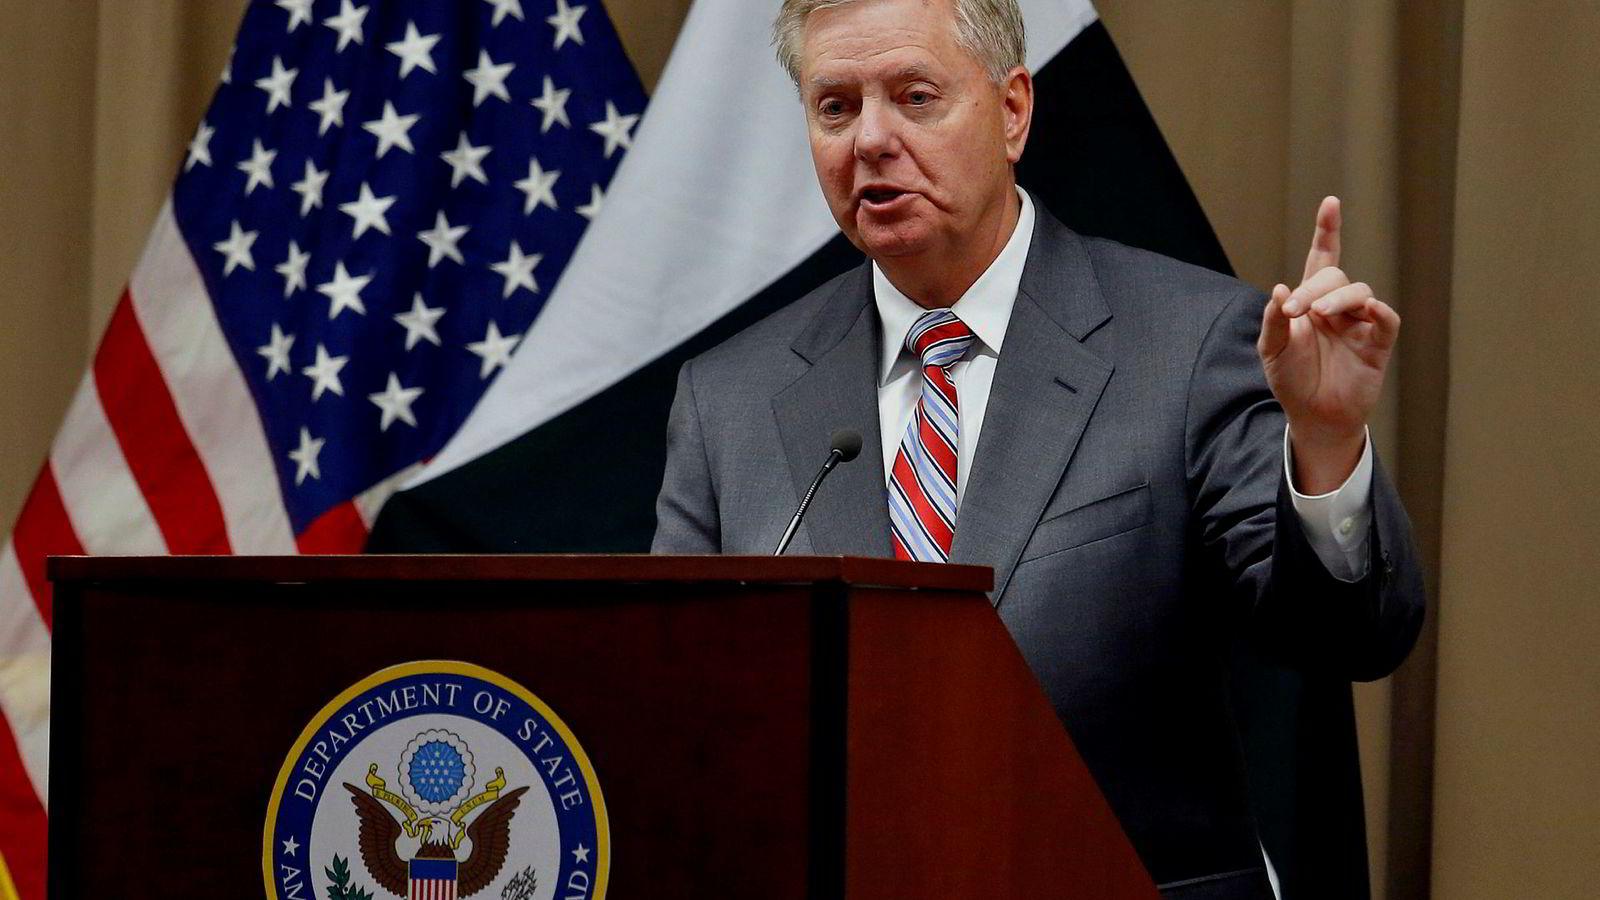 U.S. Republican Senator Lindsey Graham speaks during a press conference at the U.S. Embassy in Islamabad, Pakistan, Sunday, Jan. 20, 2019. (AP Photo/Anjum Naveed)